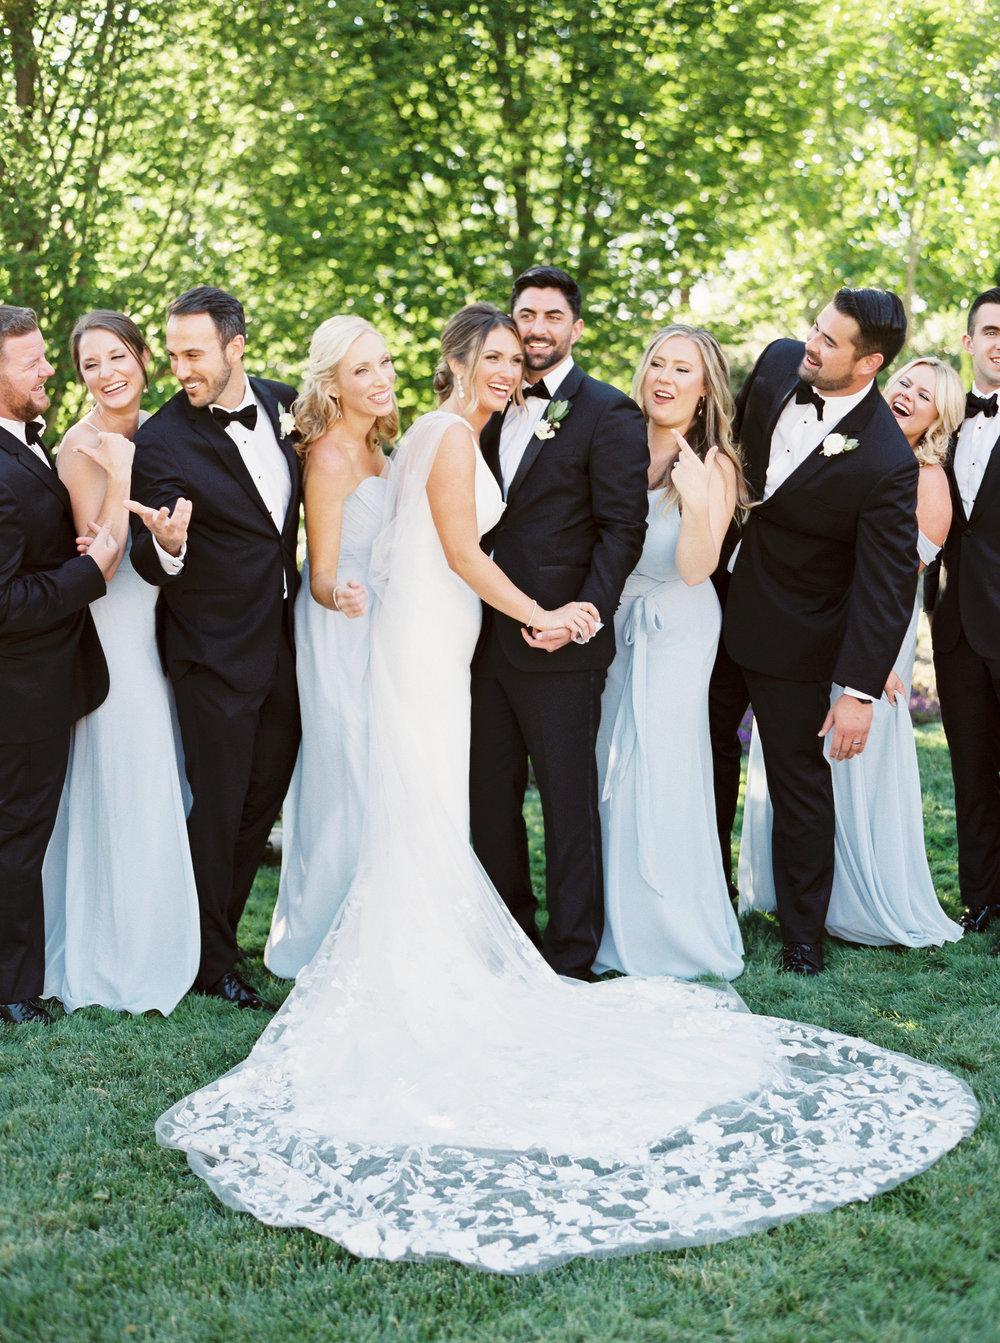 vintners-inn-wedding-in-santa-rosa-california-182.jpg